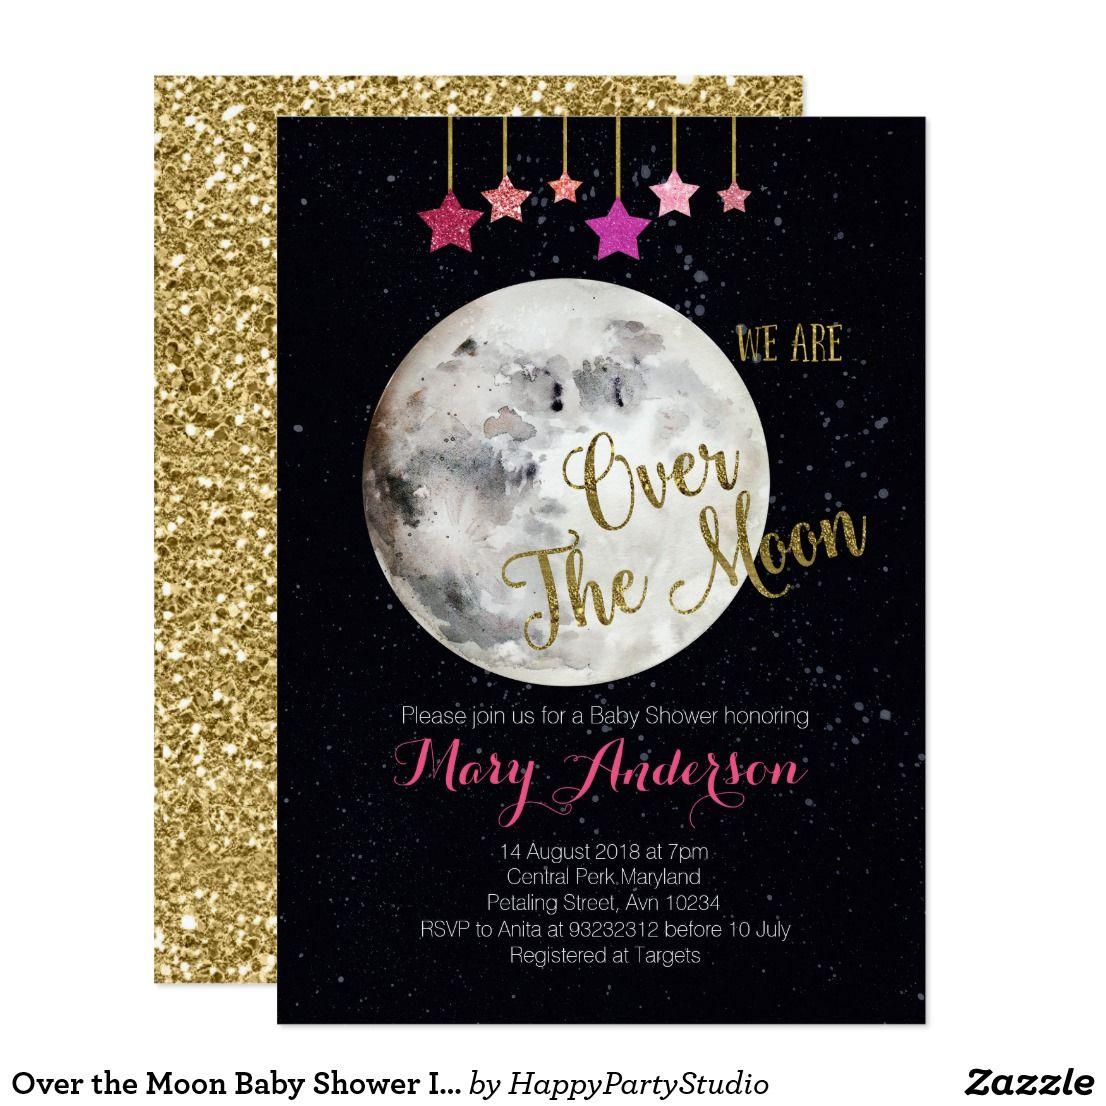 Over The Moon Baby Shower Invitation Zazzle Com Moon Baby Shower Invitation Moon Baby Shower Baby Shower Invitations